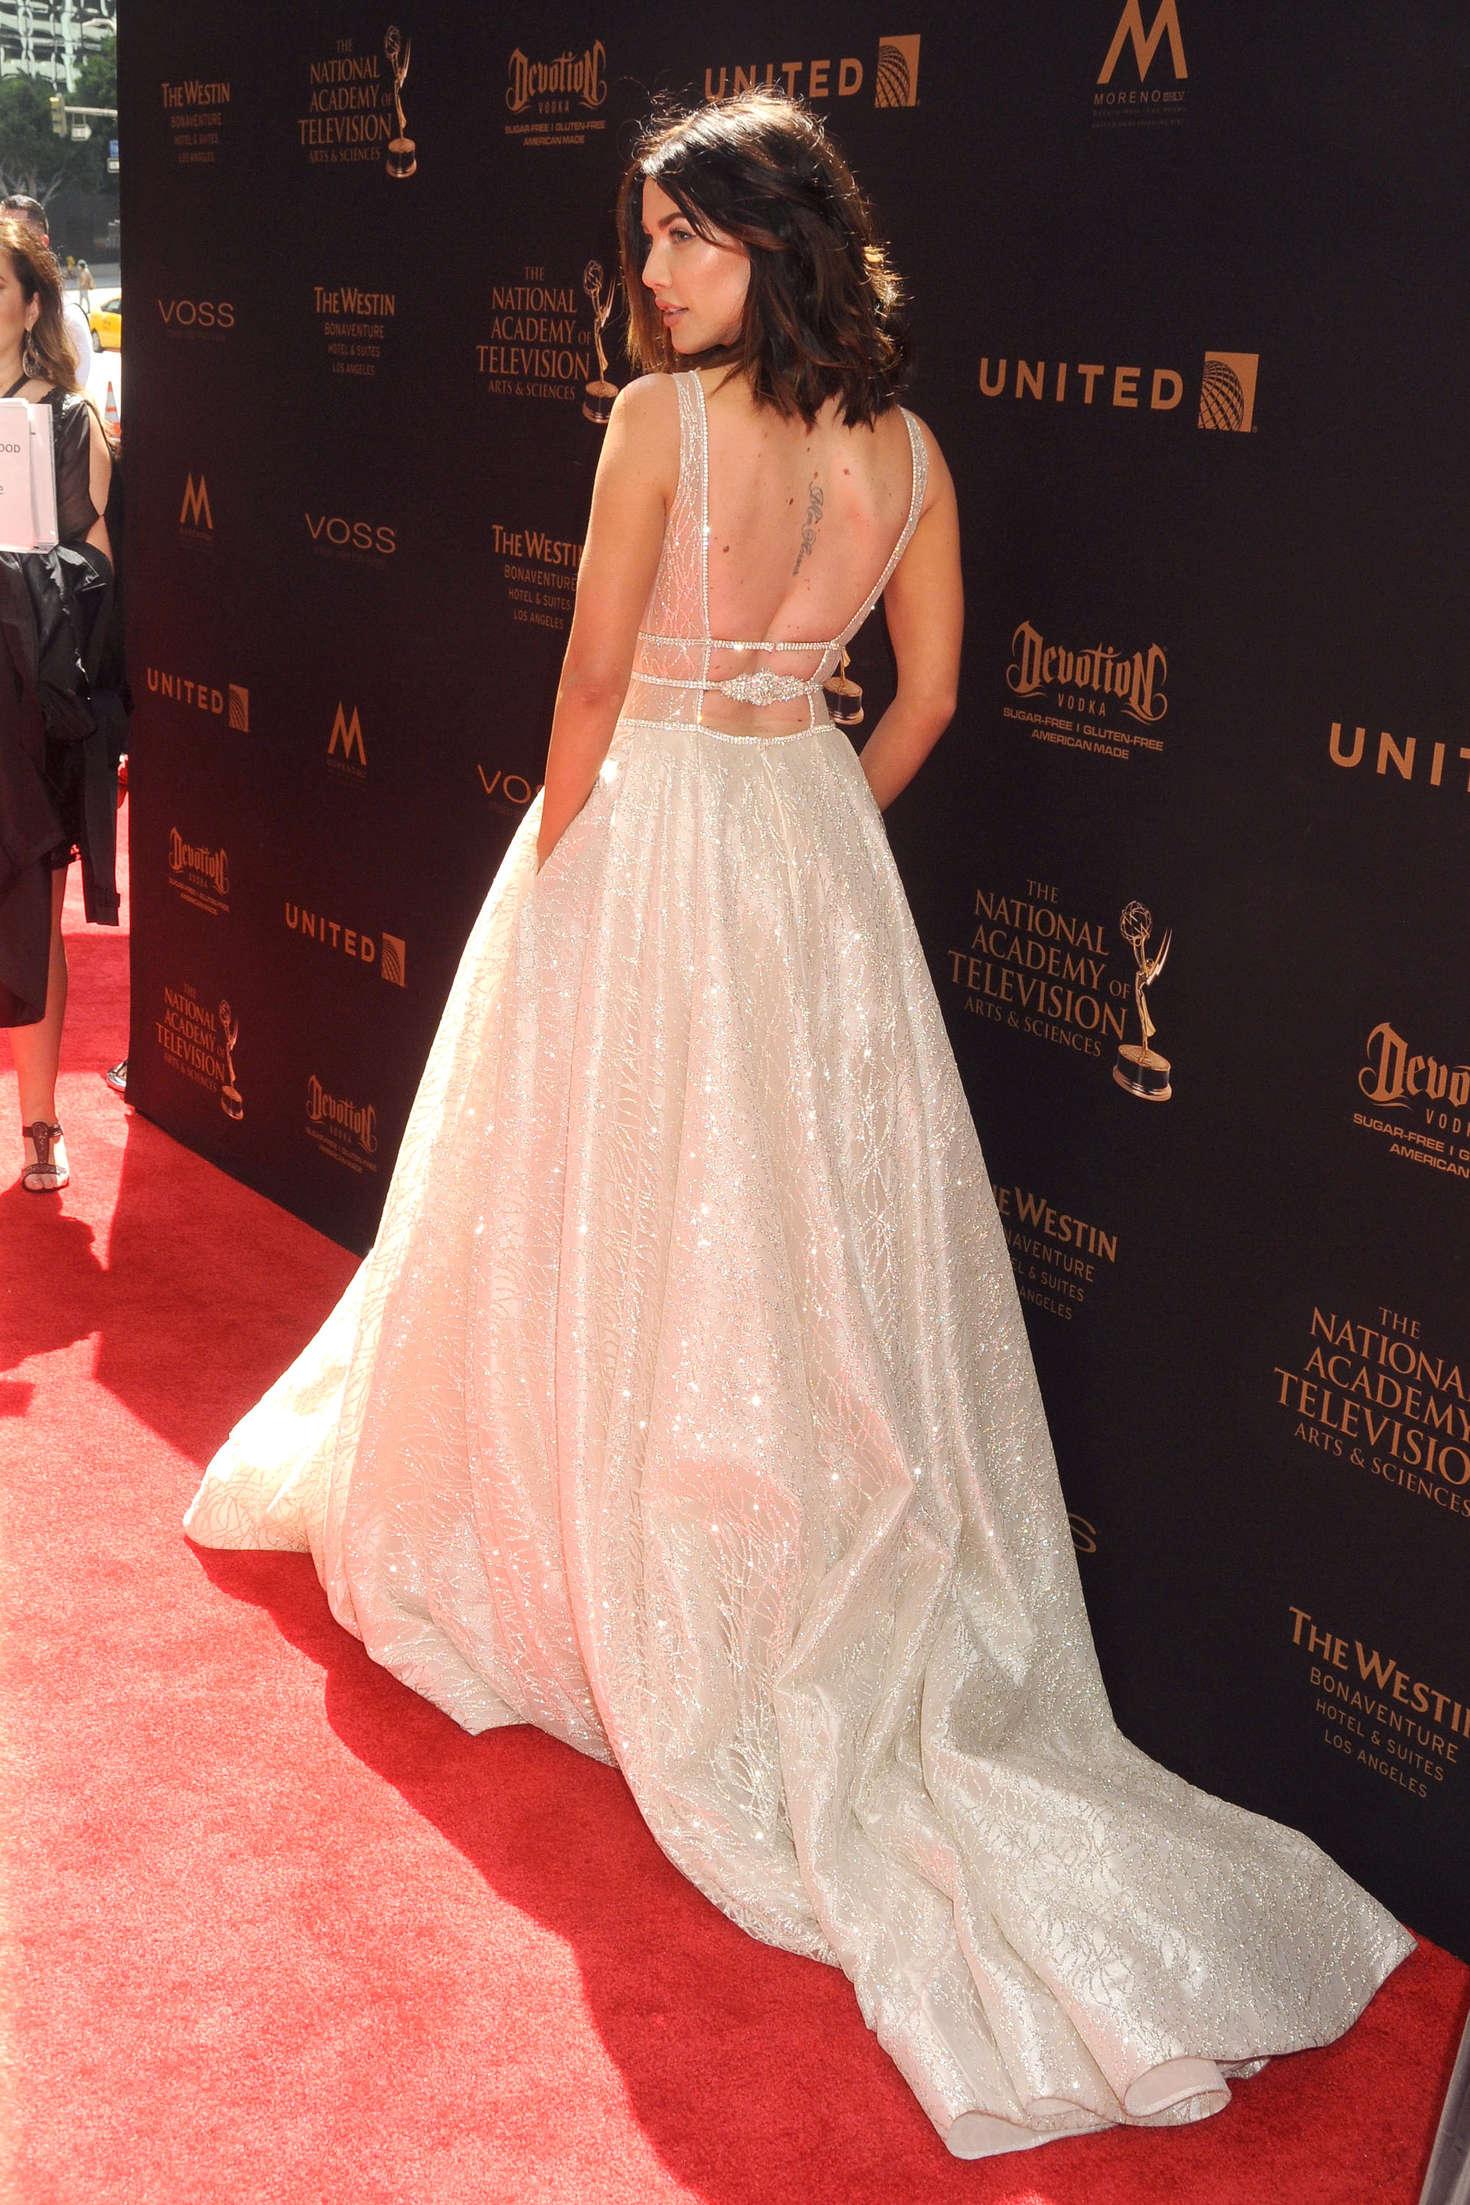 Jacqueline MacInnes Wood Daytime Emmy Awards in Los Angeles